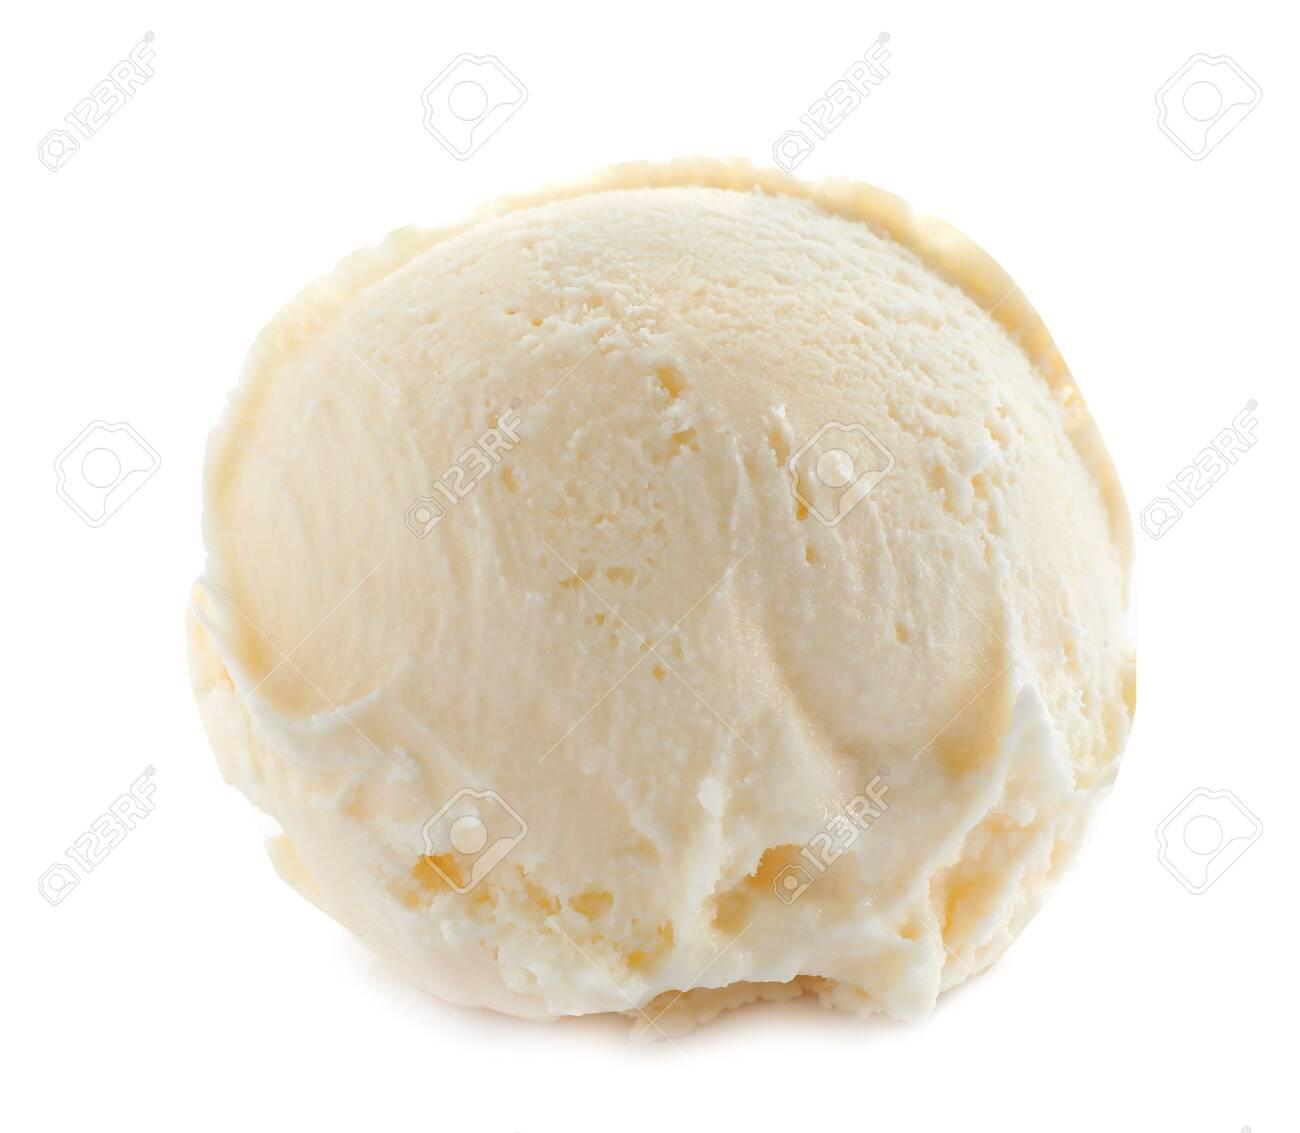 Scoop of delicious ice cream on white background - 128862641